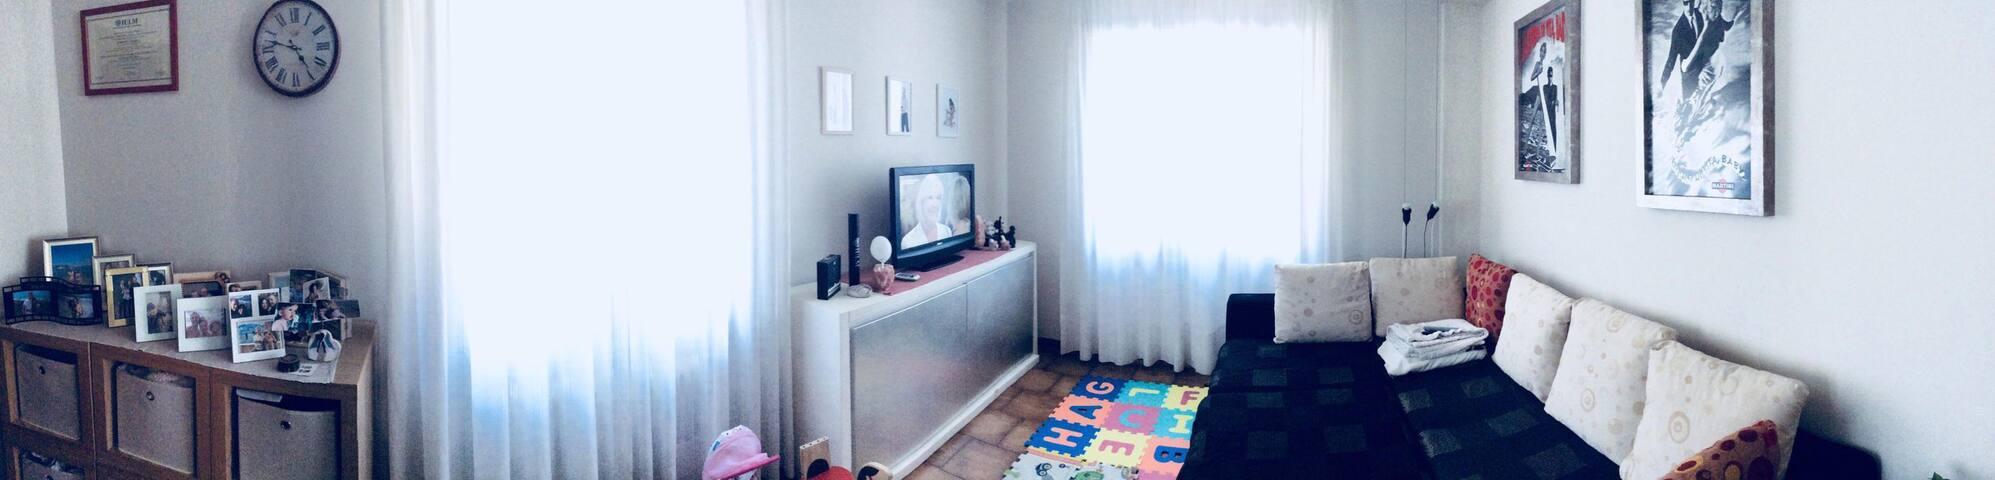 Spacious apartment in a convenient location.